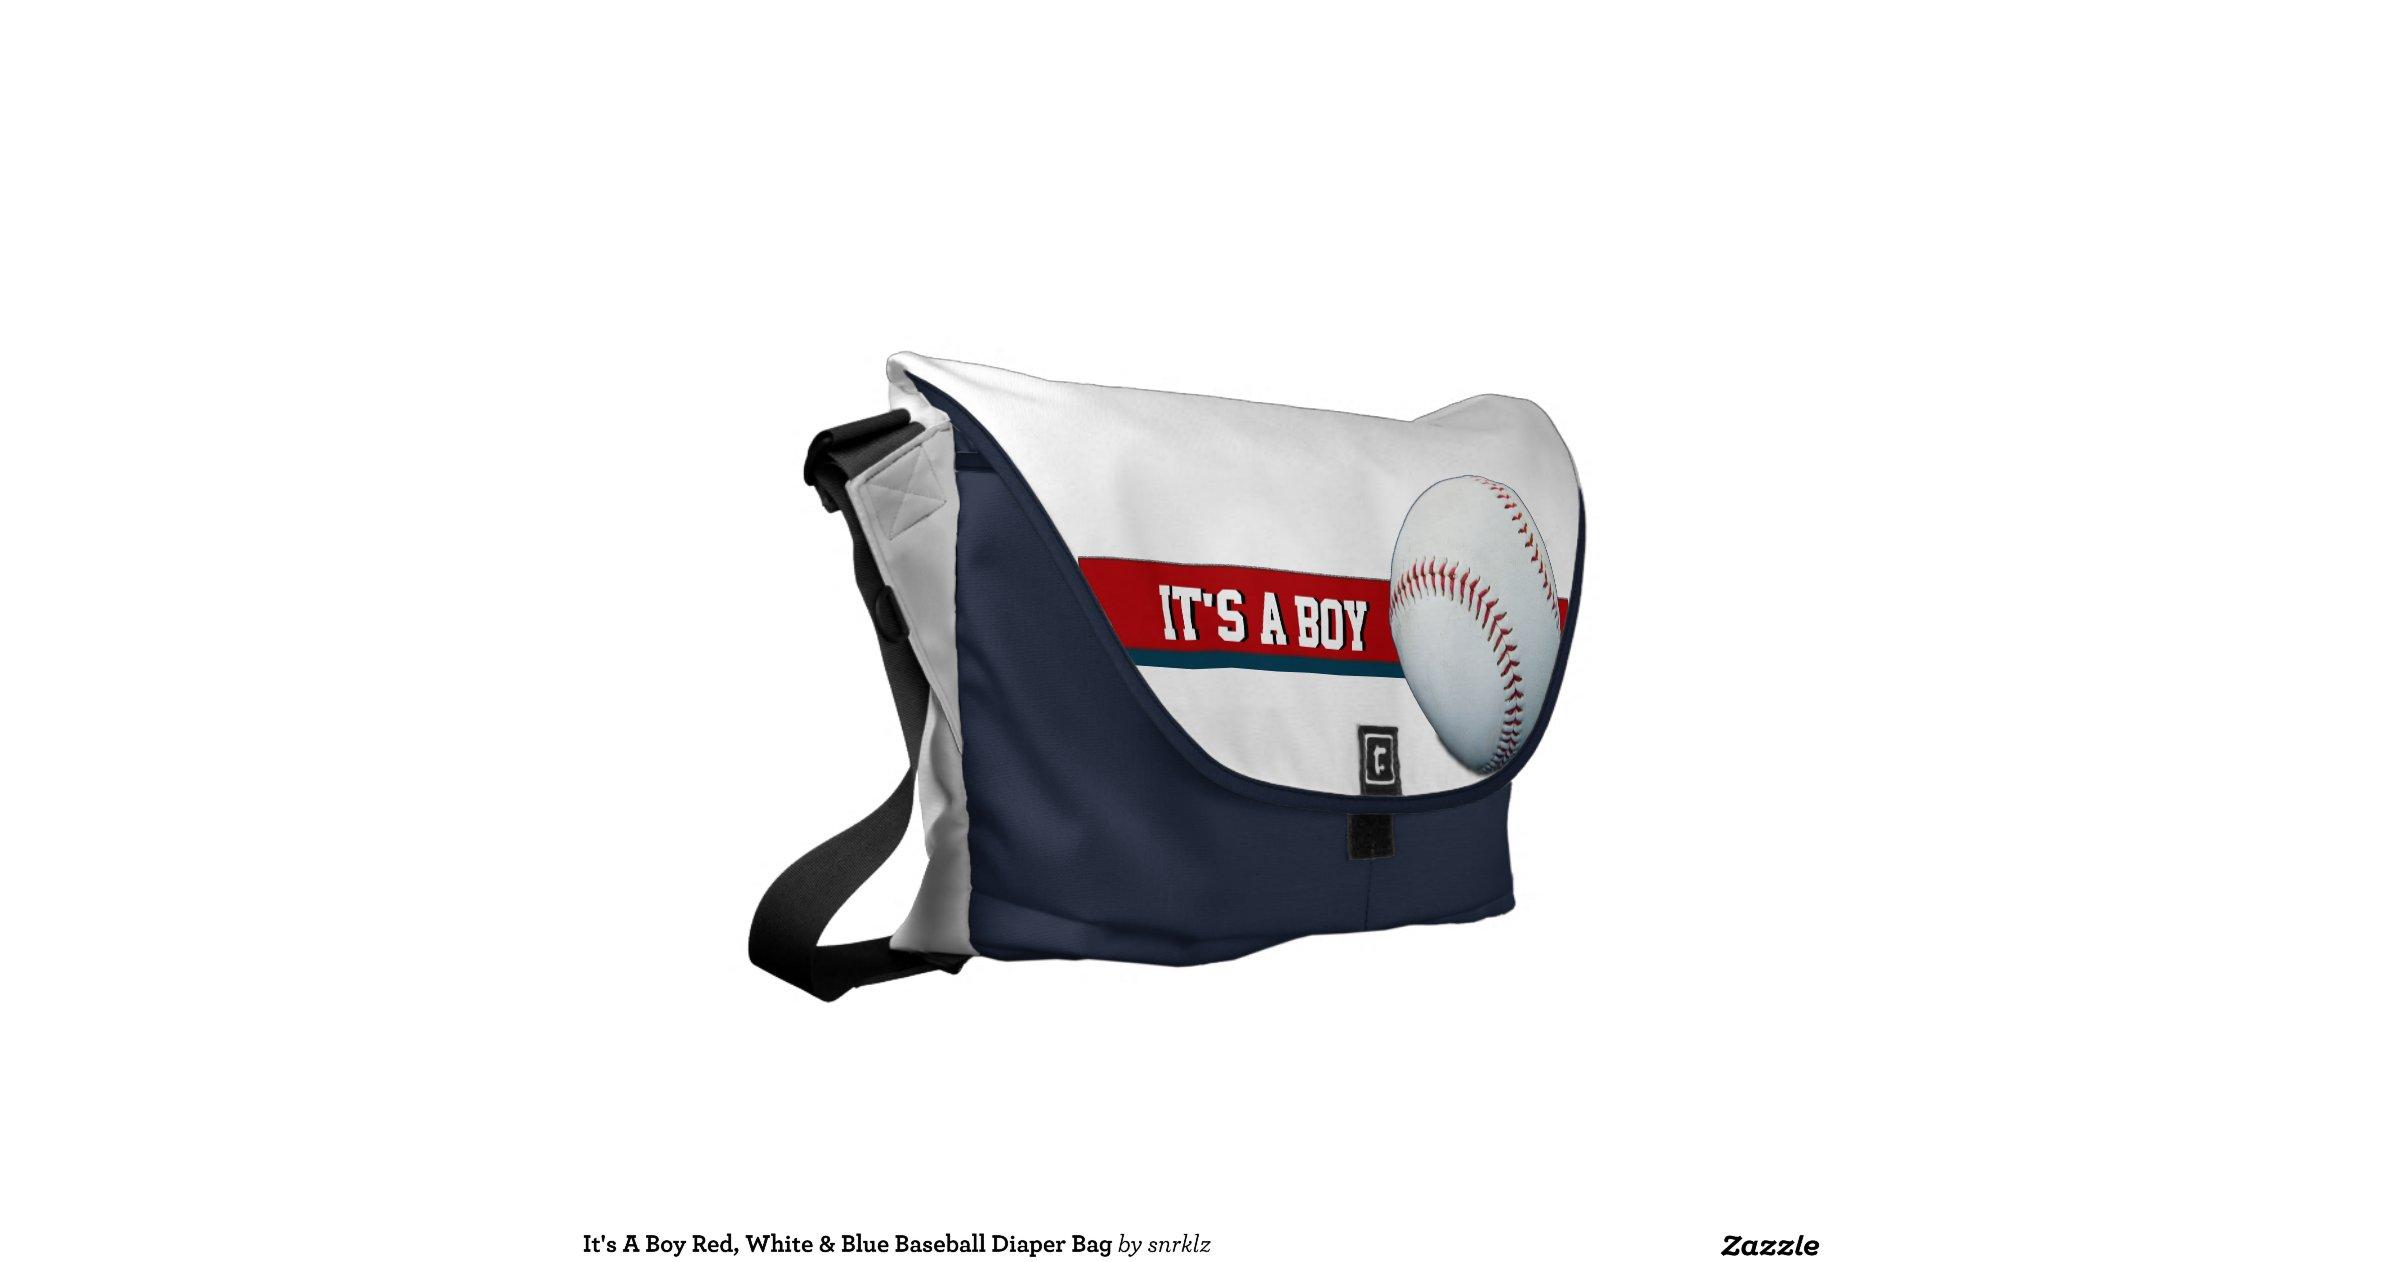 it 39 s a boy red white blue baseball diaper bag commuter bag zazzle. Black Bedroom Furniture Sets. Home Design Ideas